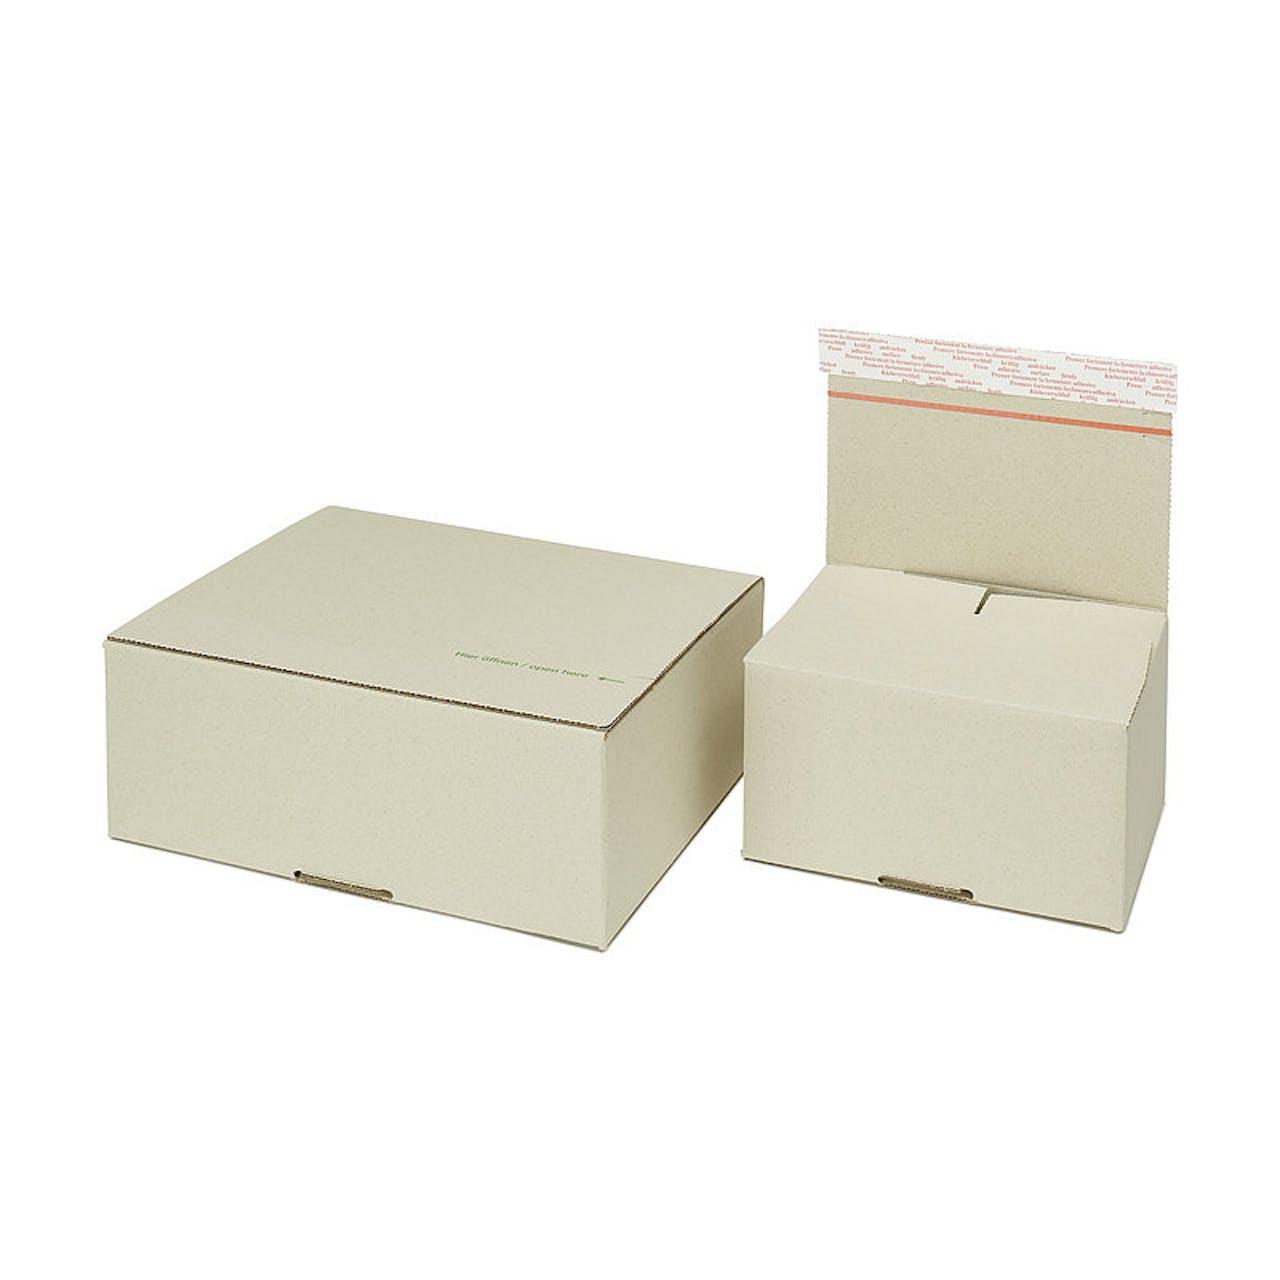 Graspapier-Speedbox Karton